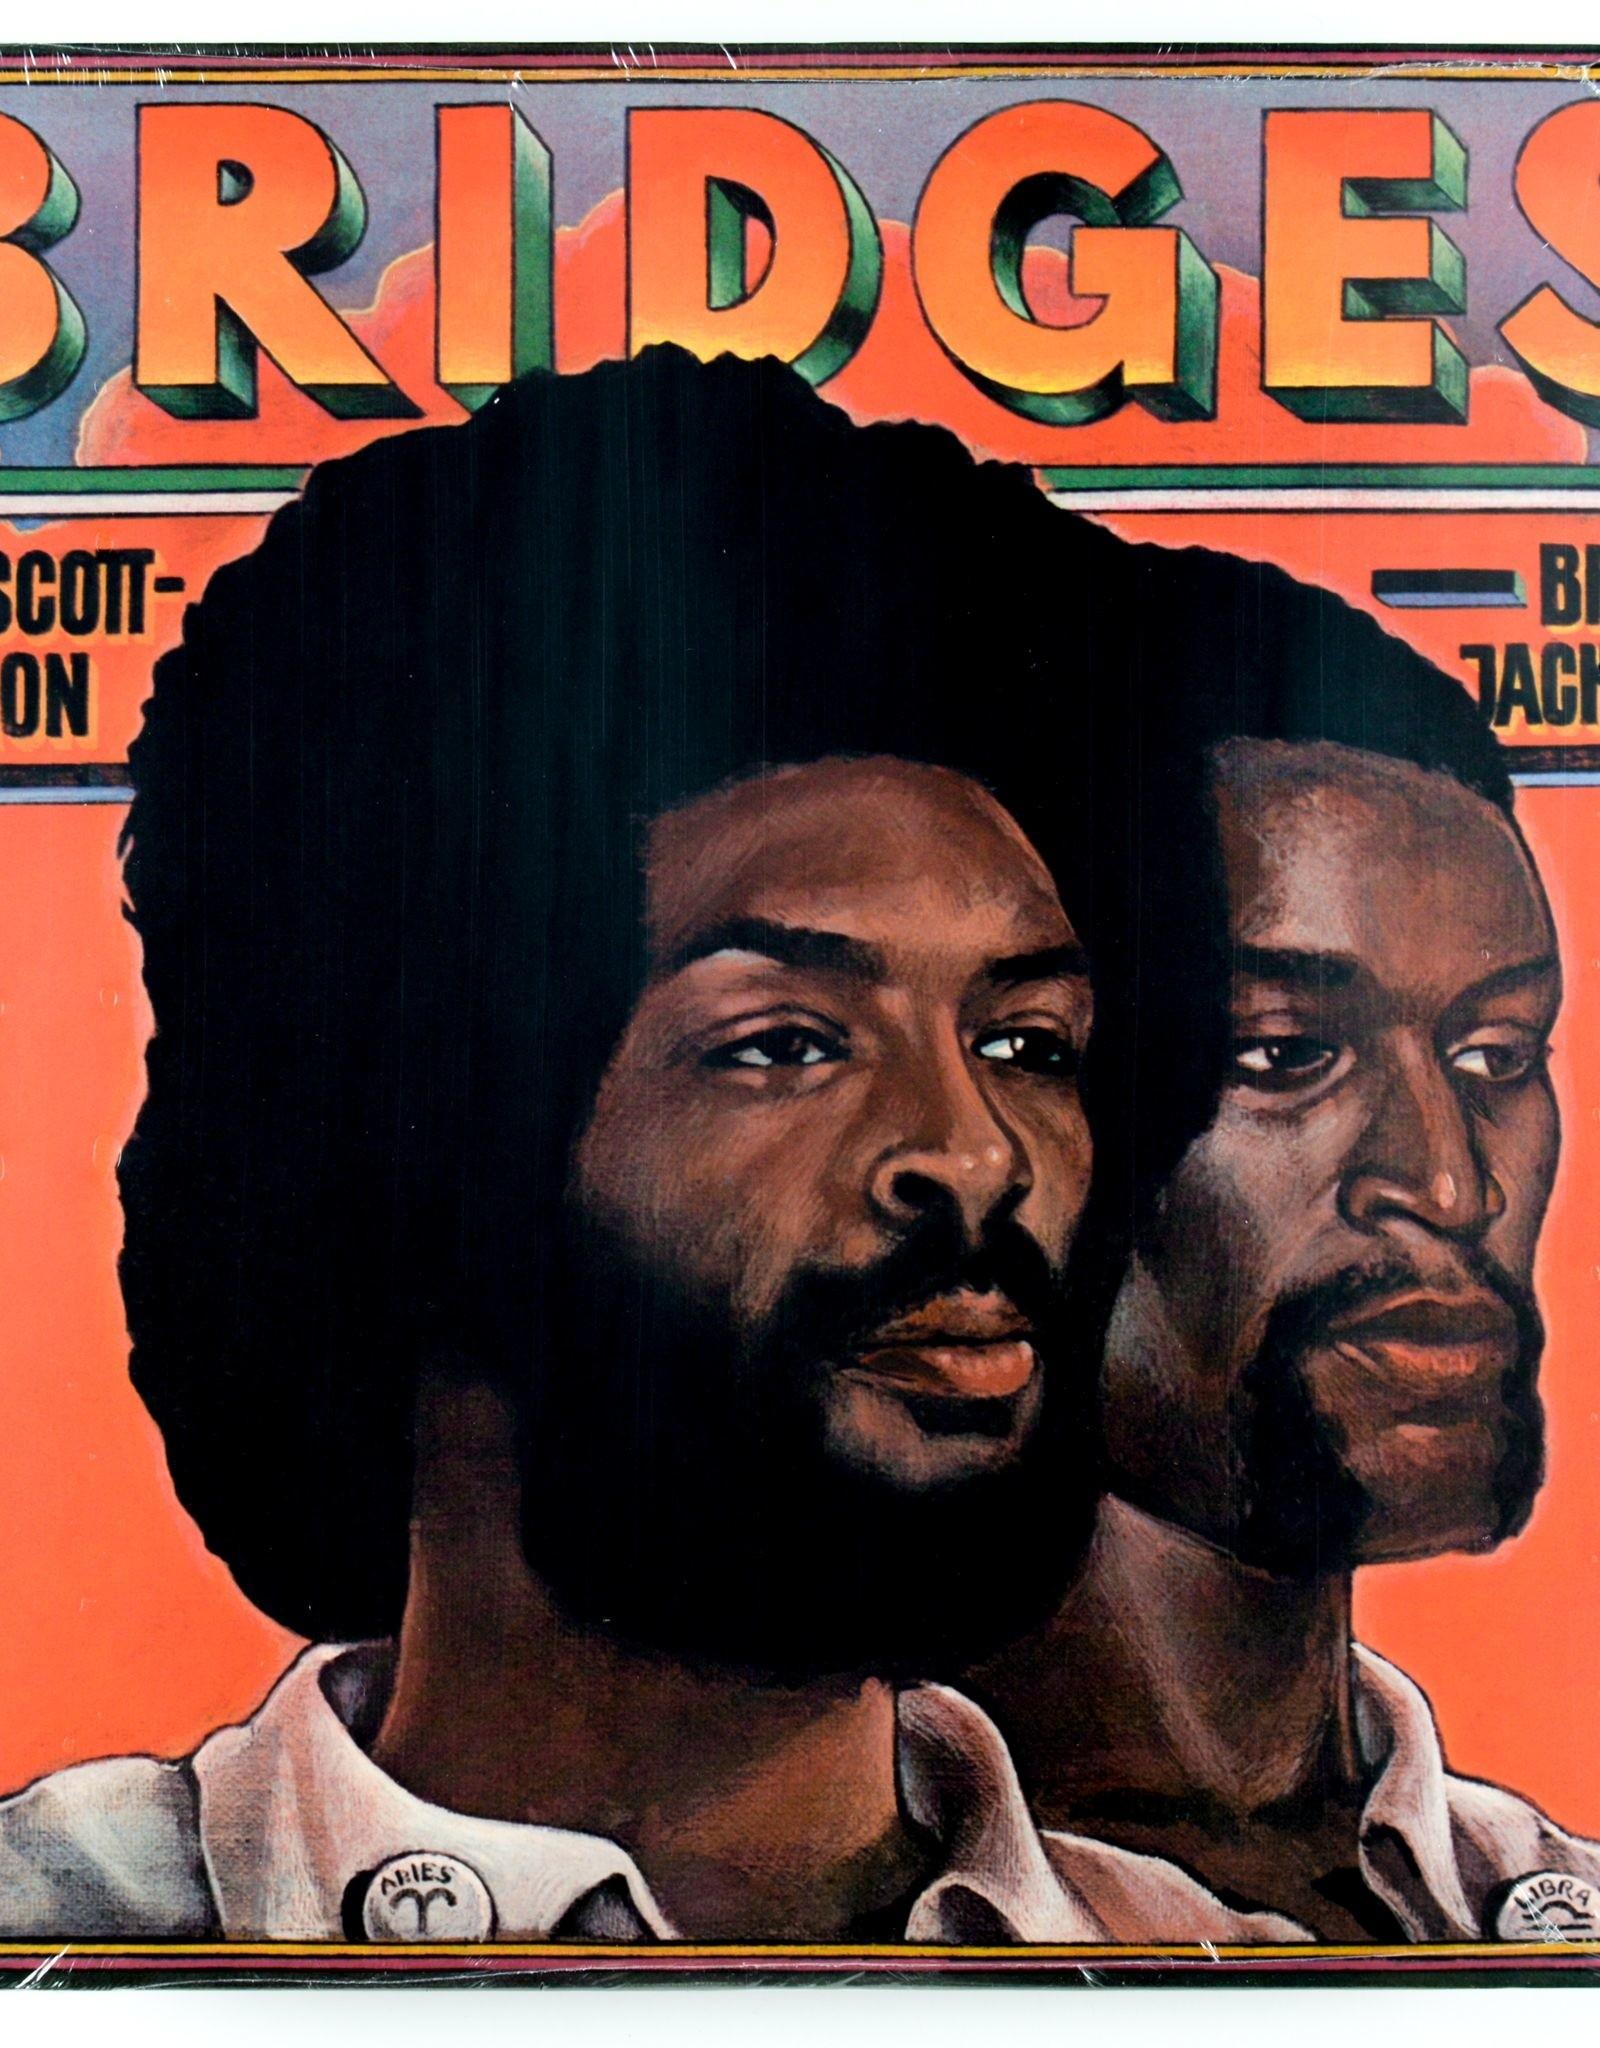 Gil Scott-Heron / Brian Jackson - Bridges